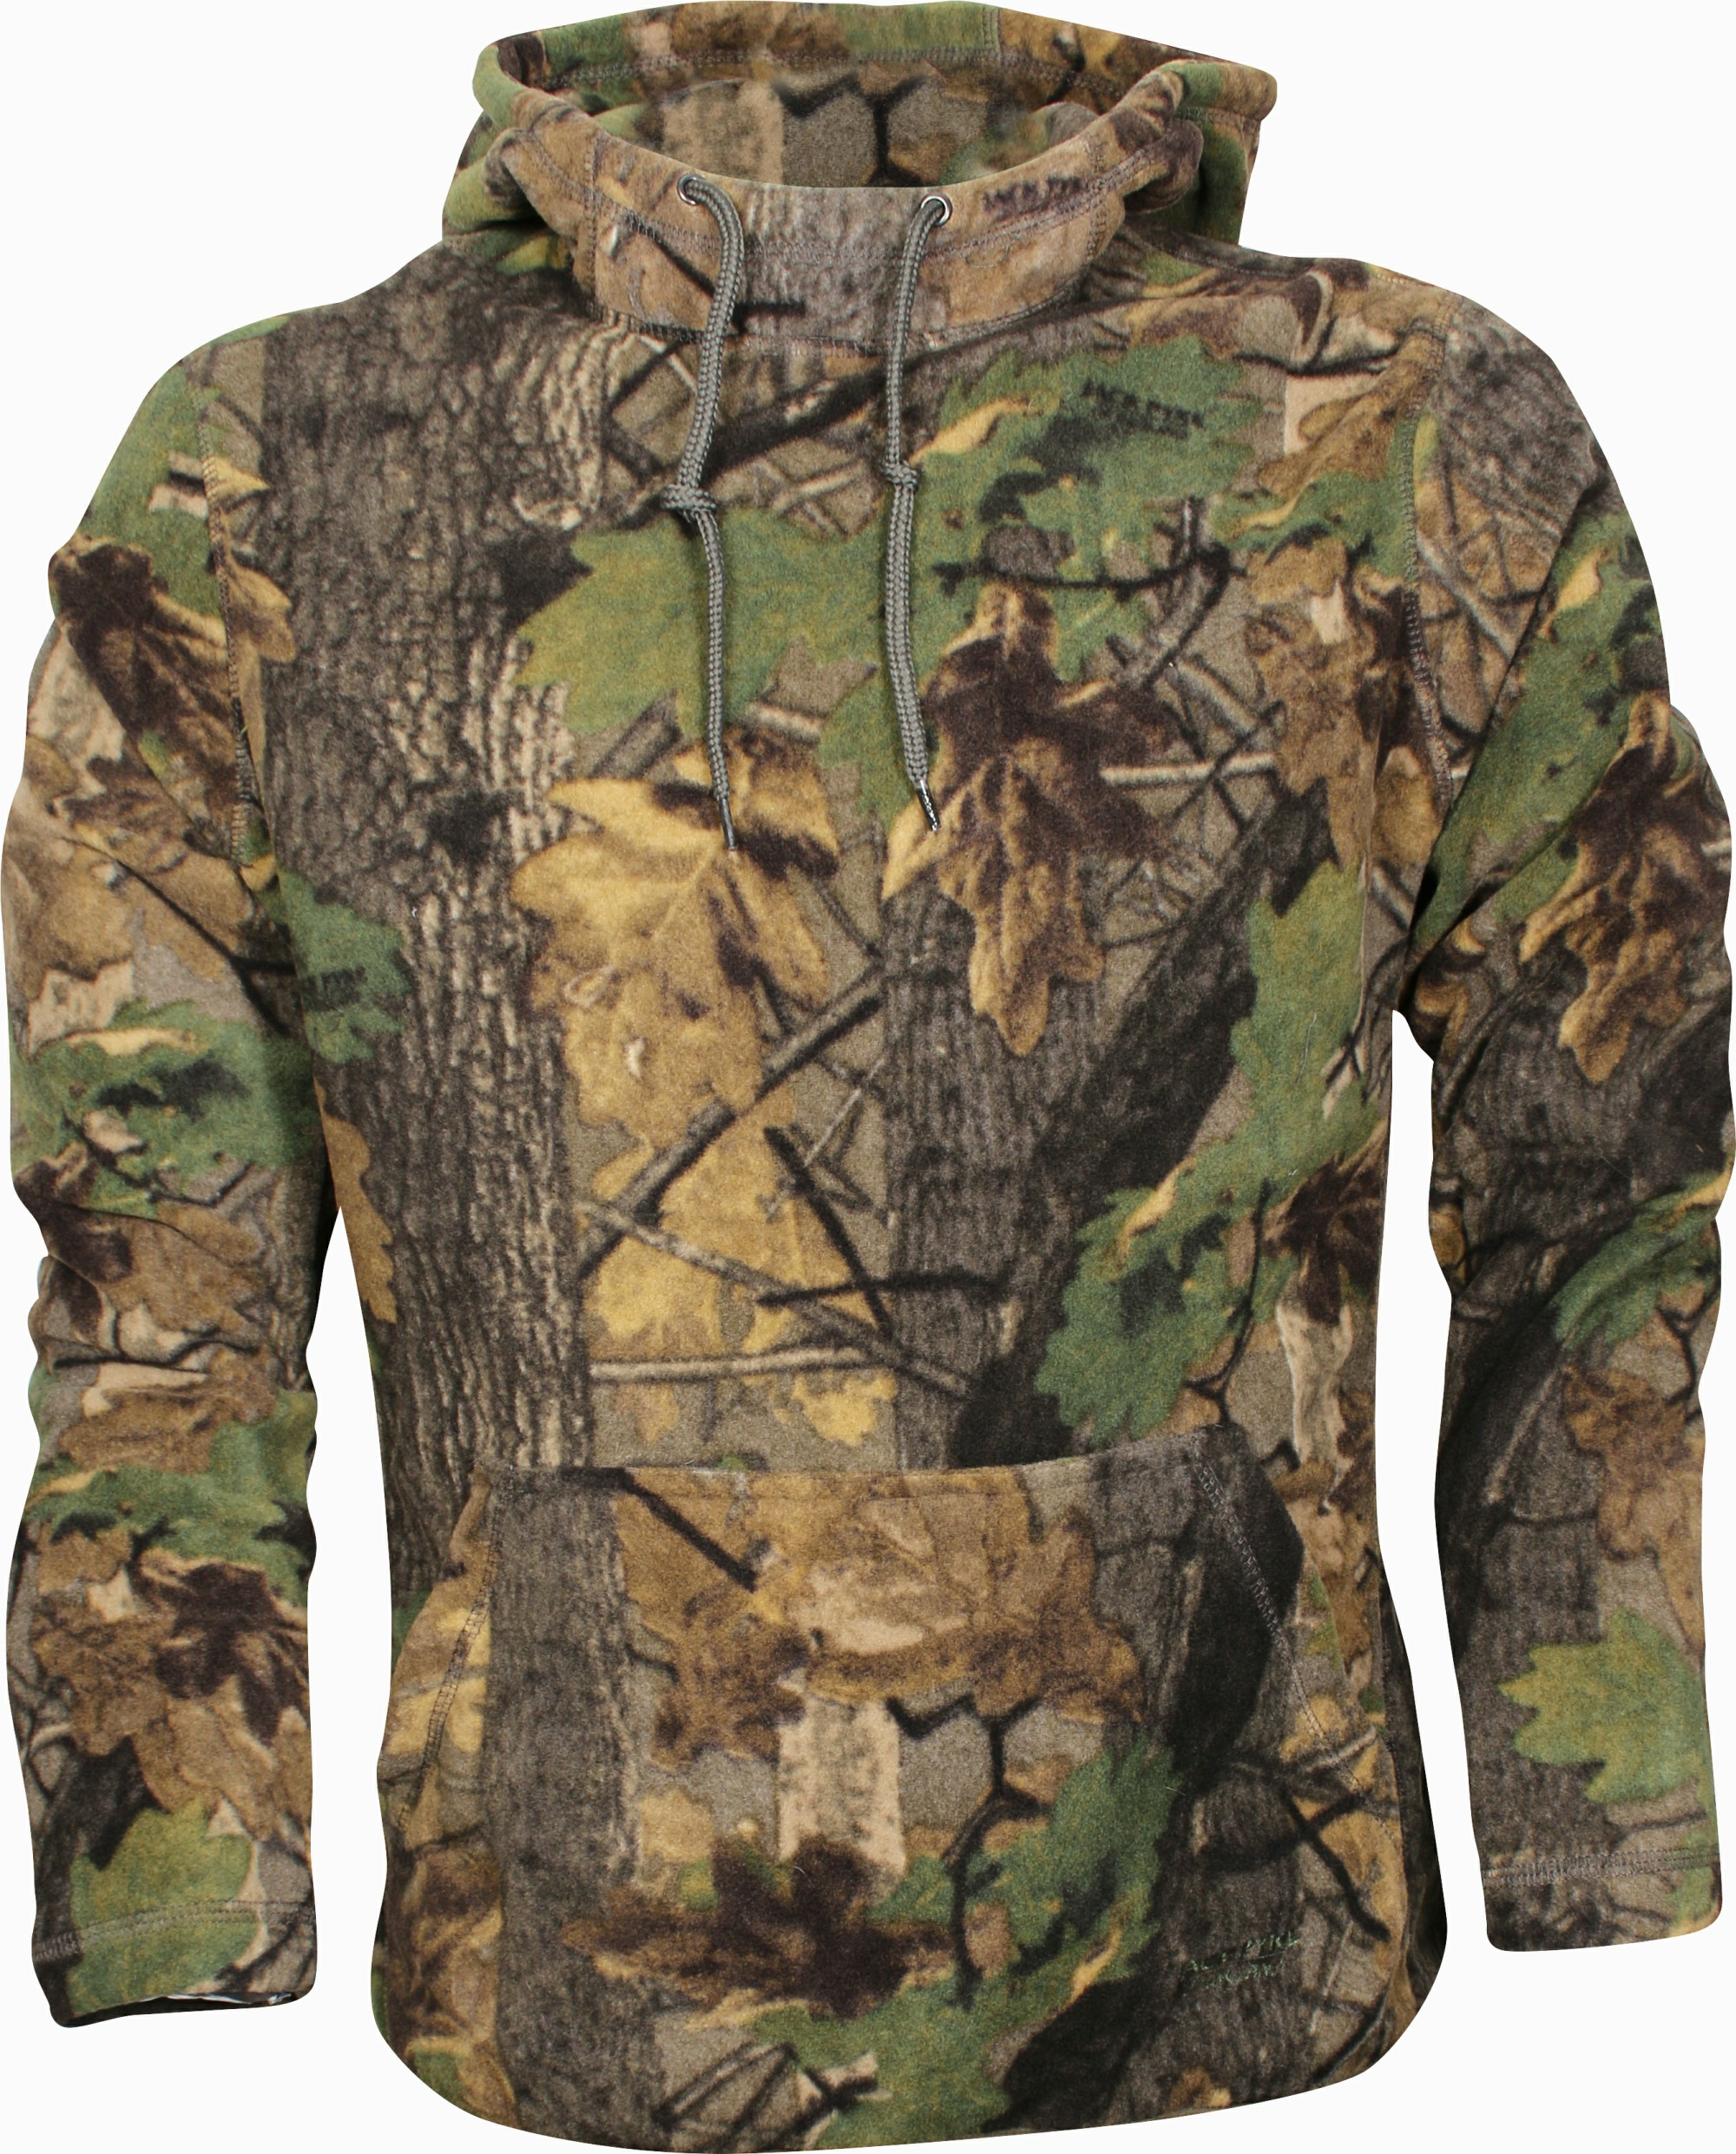 Jack pyke fieldman fleece hoodie top hunting fishing for Green top hunt fish